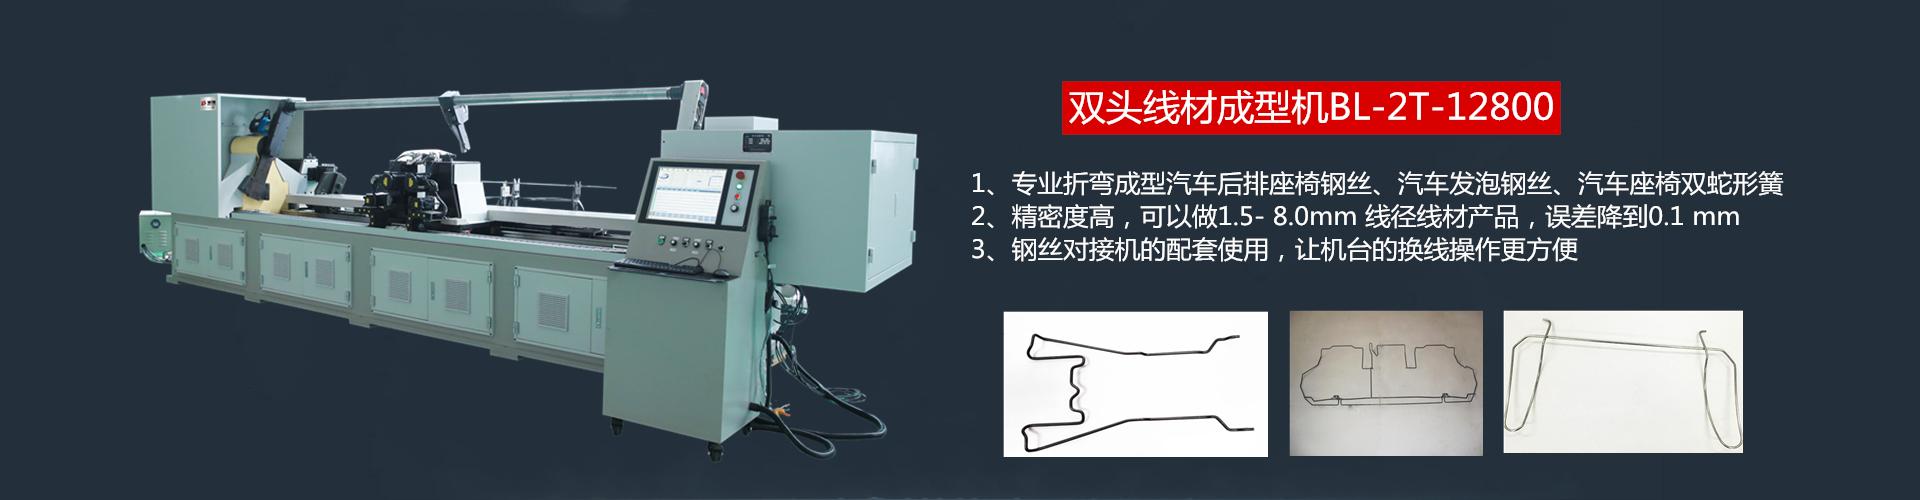 yi形线cai成型机